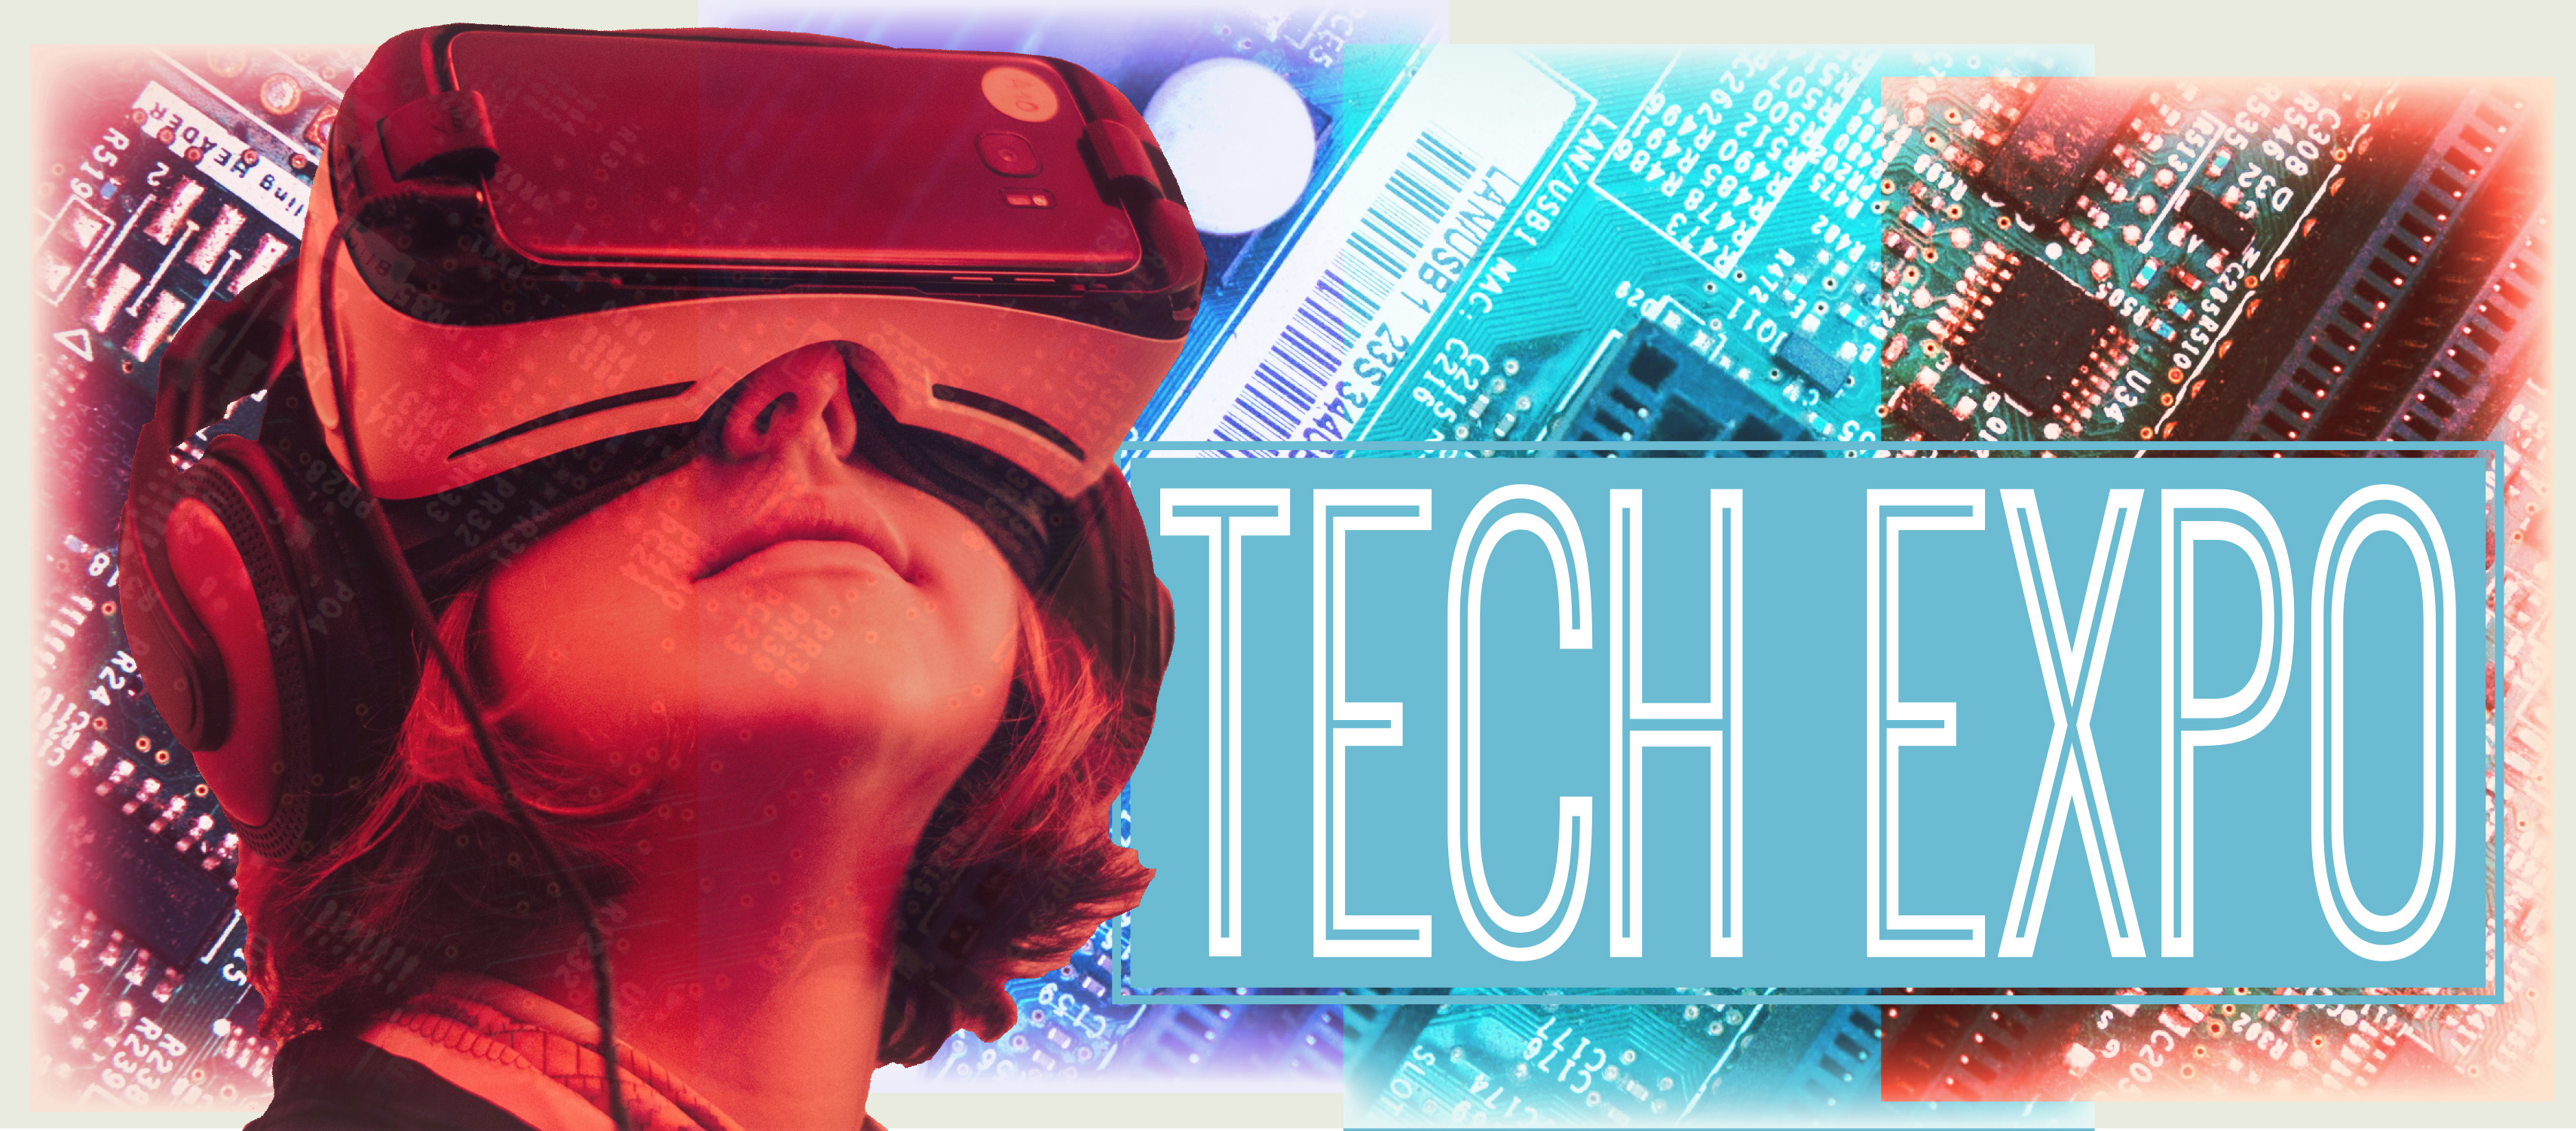 Tech Expo graphic